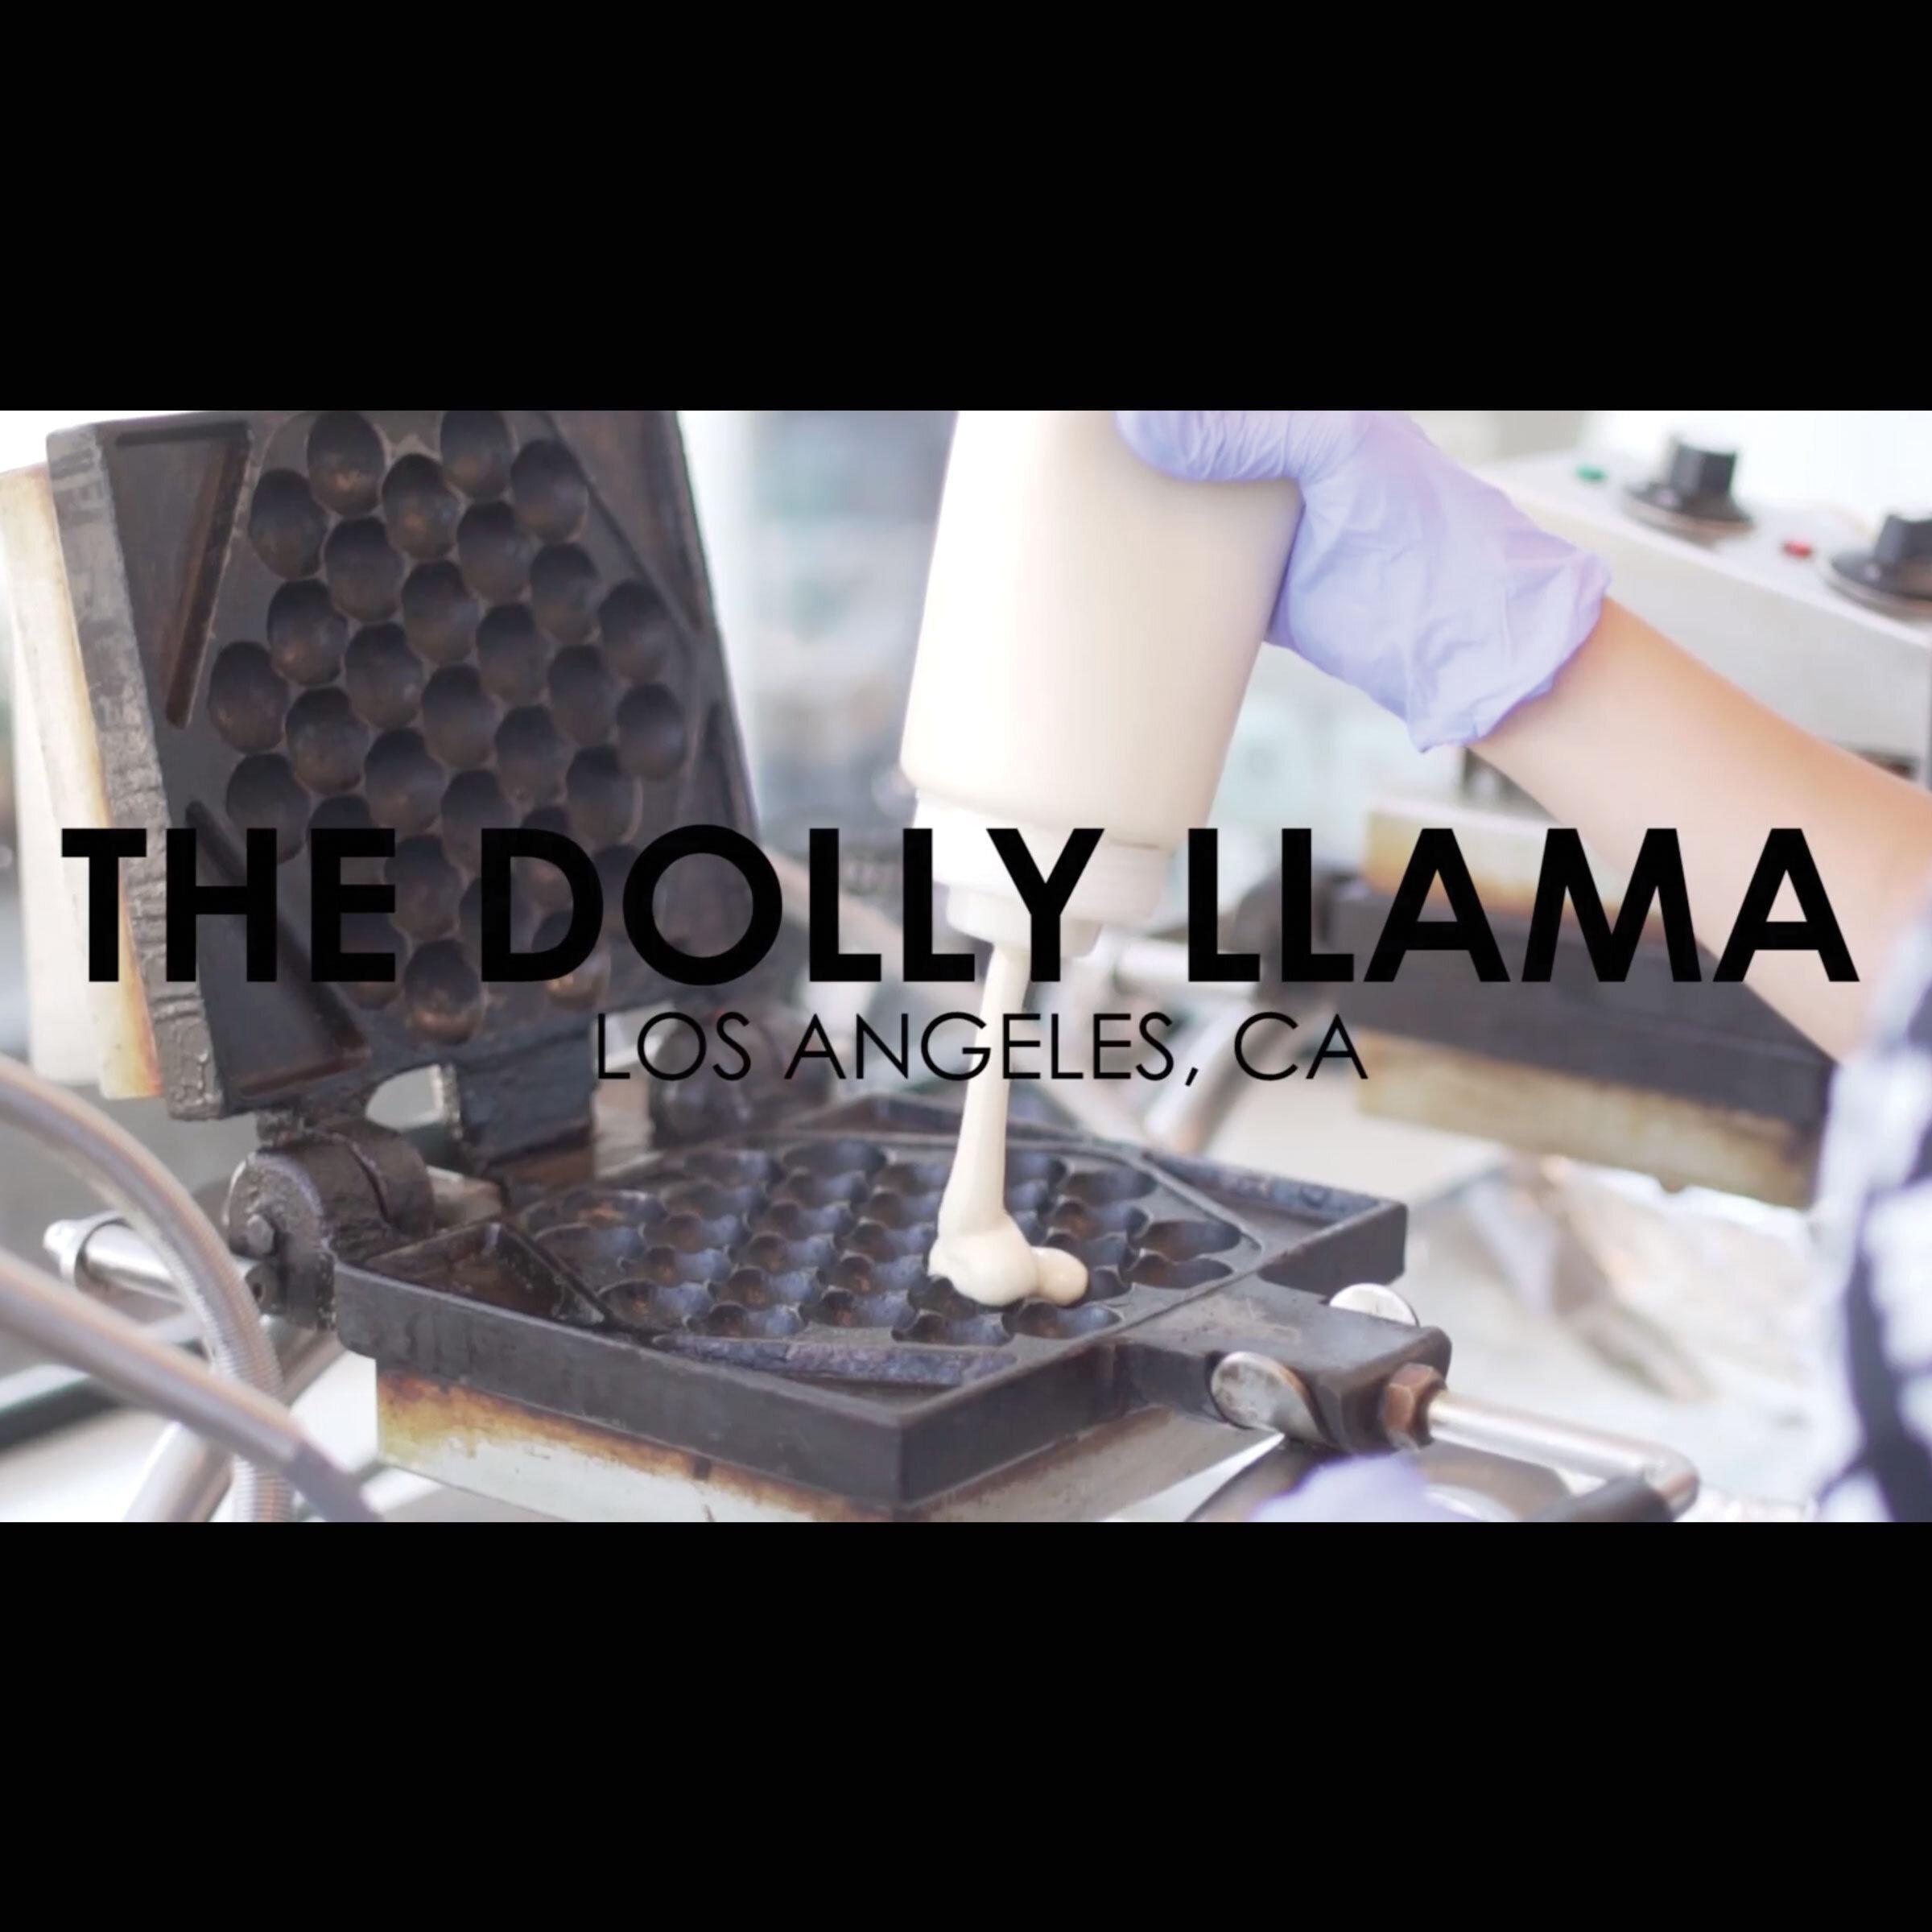 CASE. CC // 1005  THE DOLLY LAMA